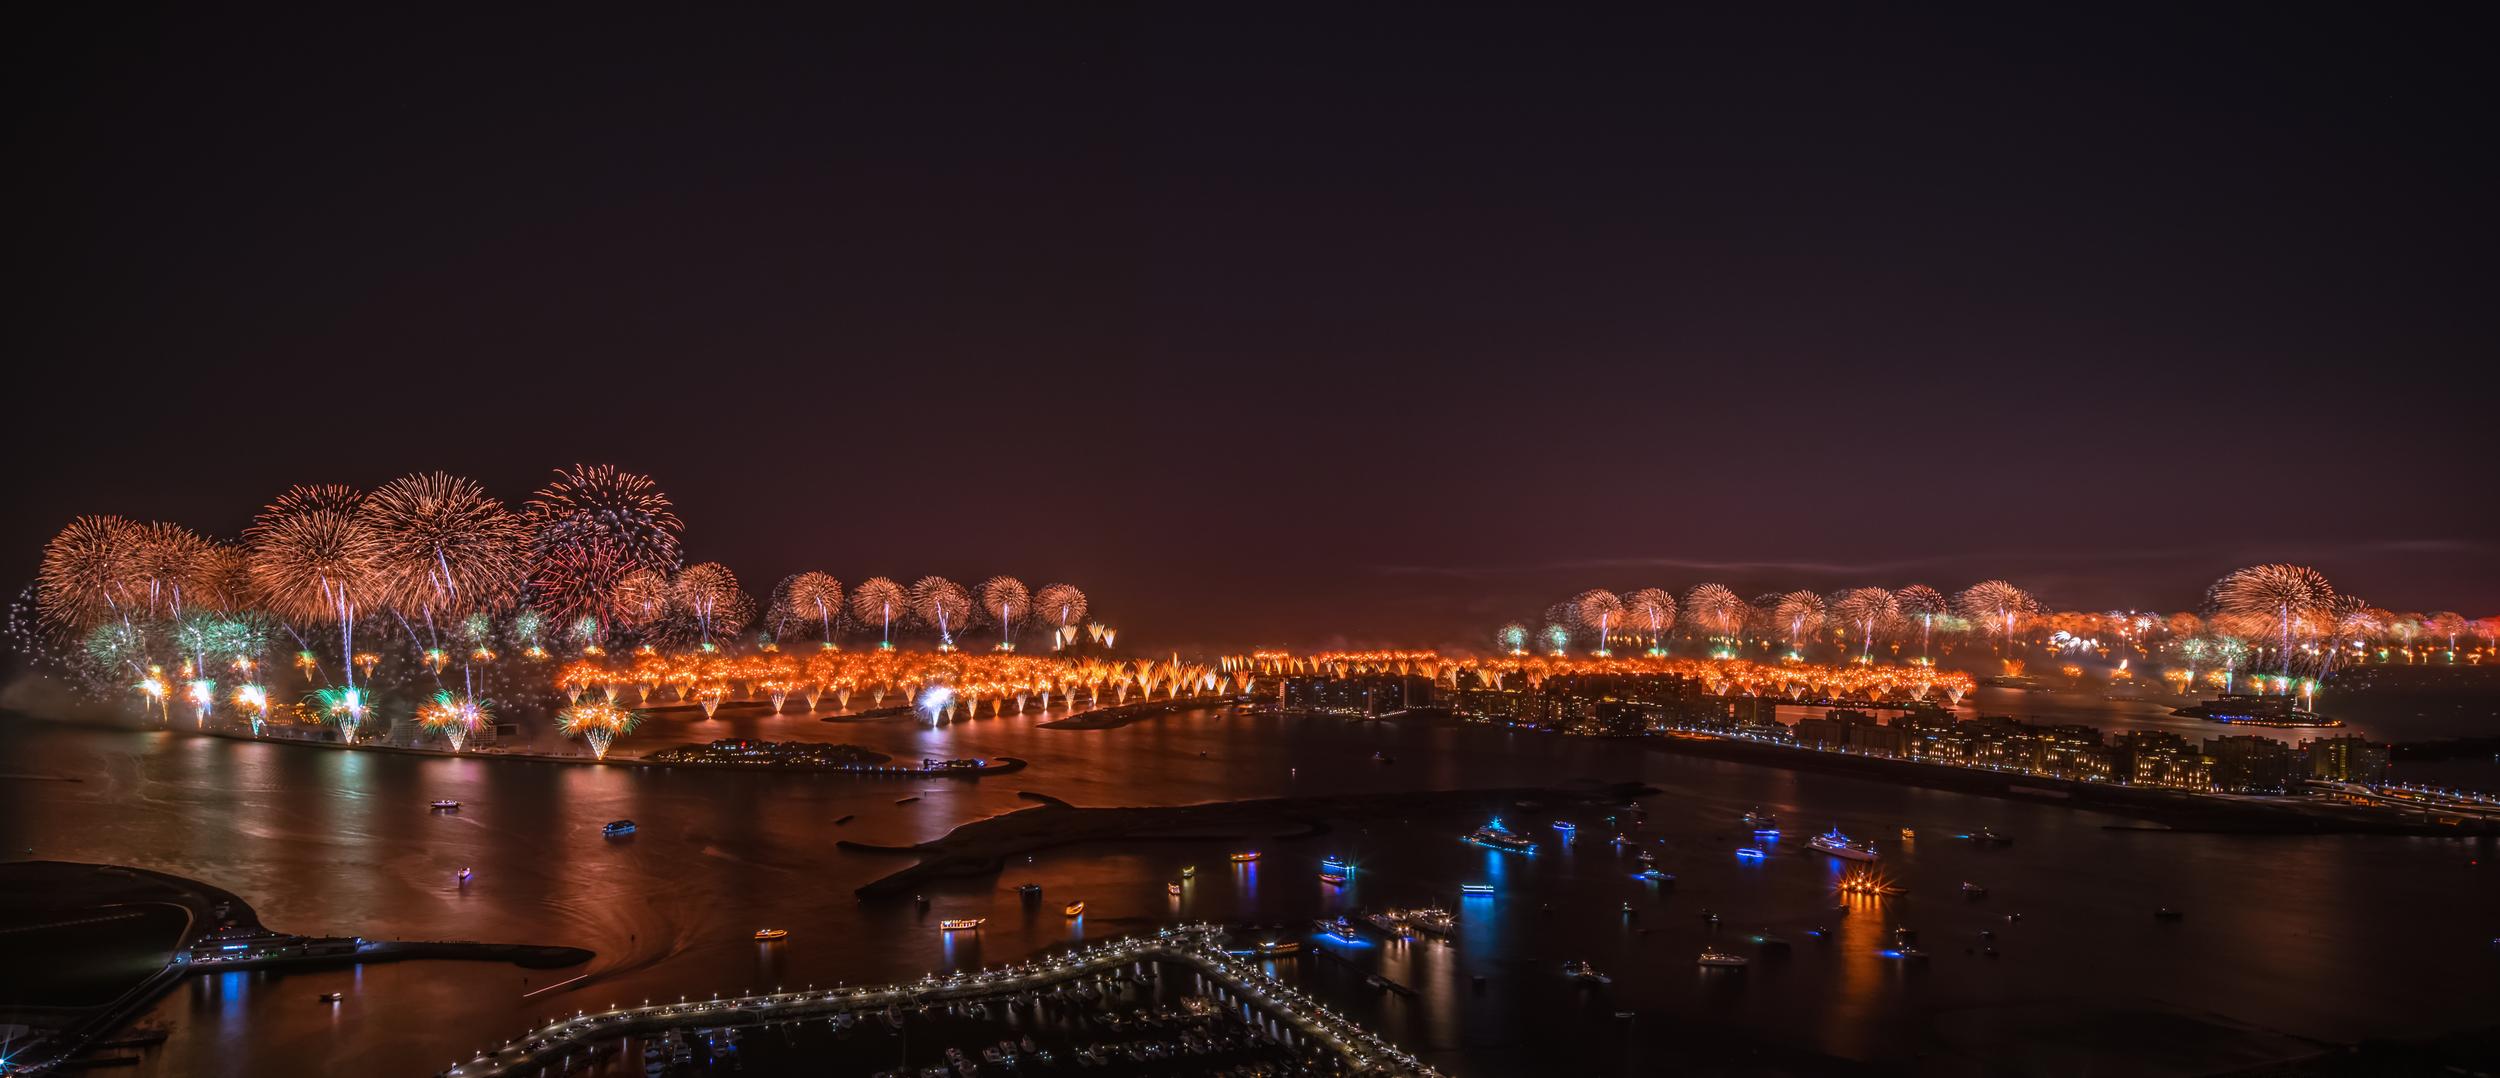 World record fireworks at the Jumeirah Palm, Dubai 2014